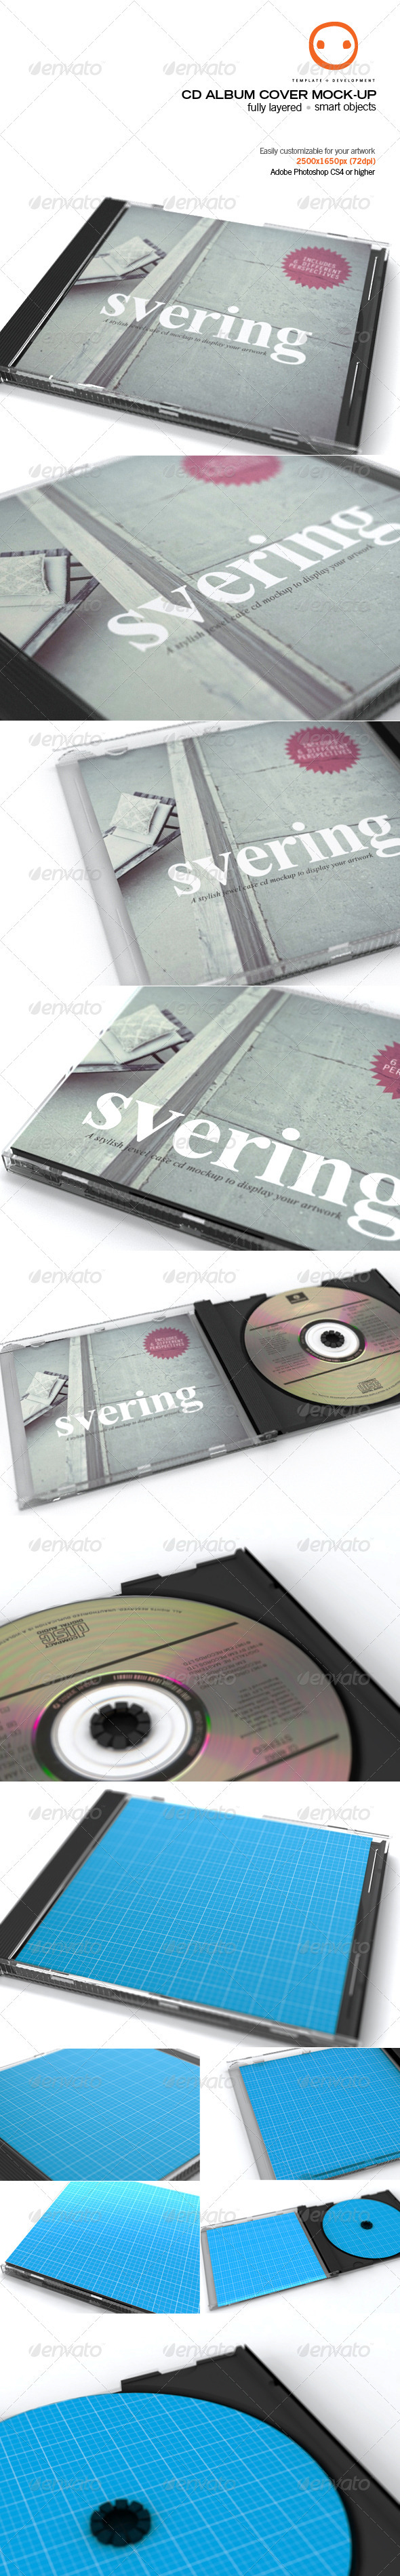 CD Album Cover Mock-up - Discs Packaging